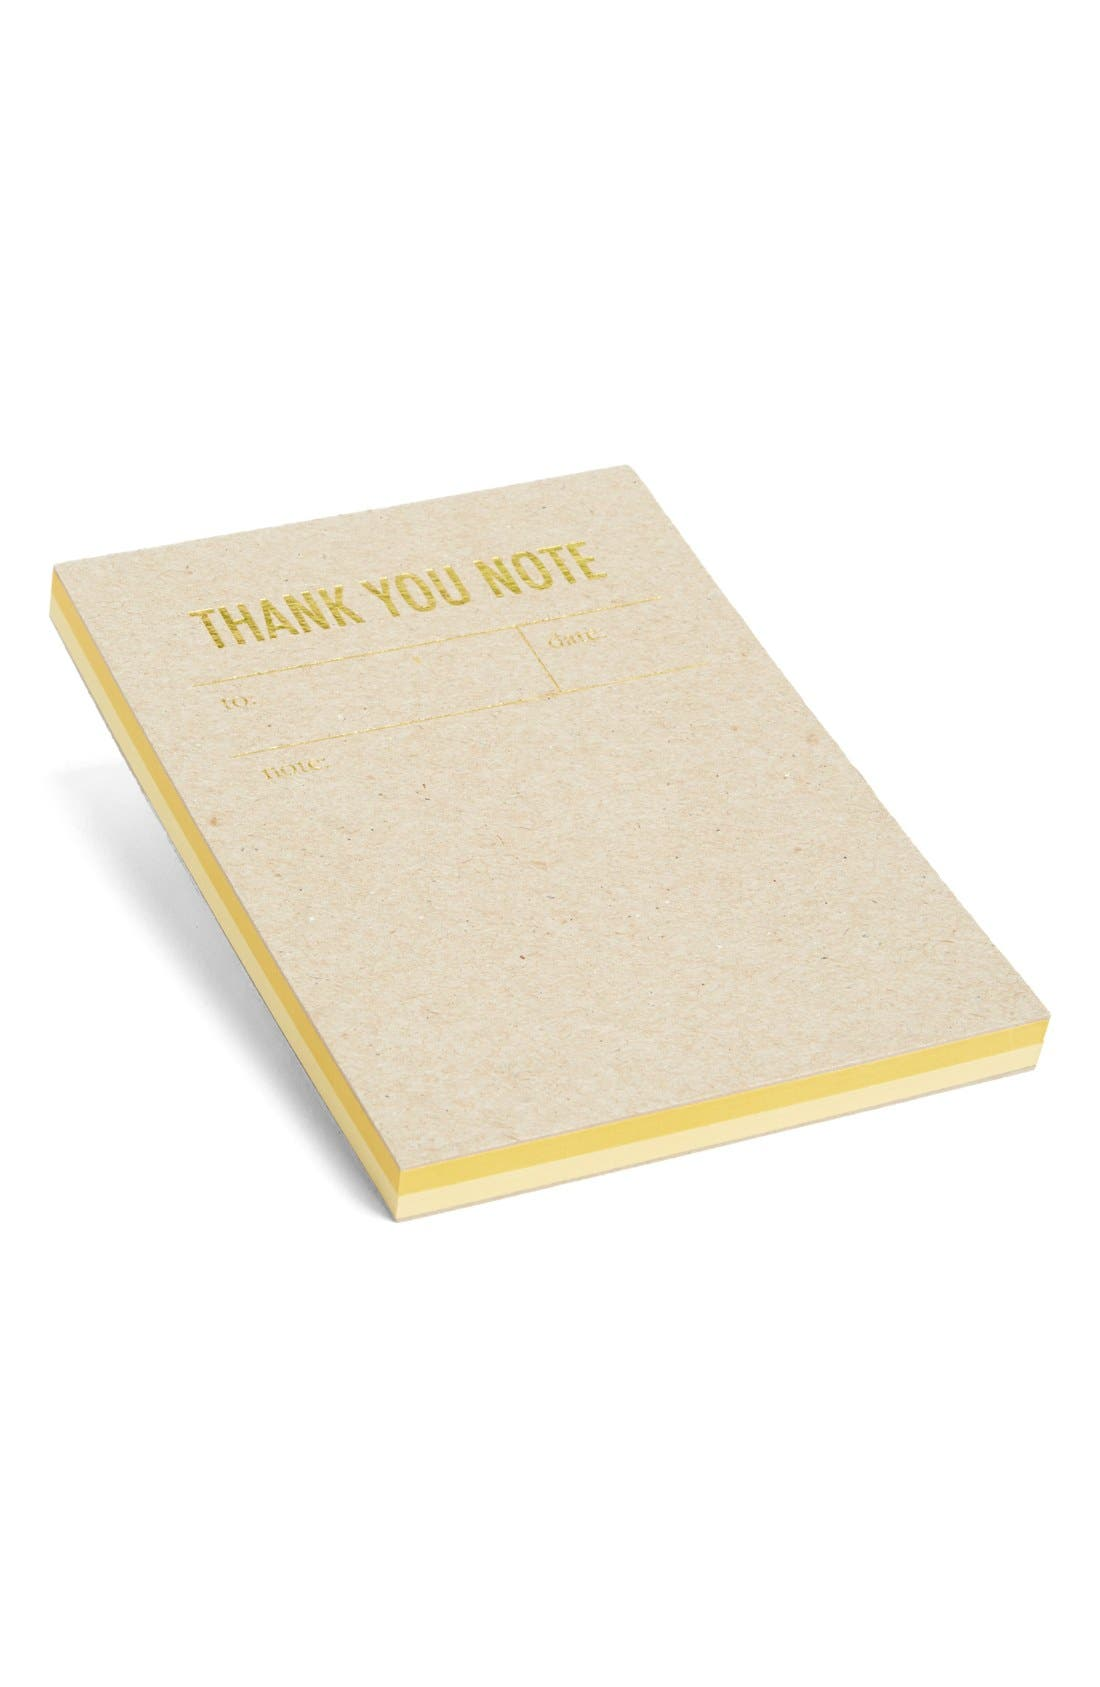 Alternate Image 1 Selected - Tokketok 'Thank You Note' Letterpress Note Cards (Set of 30)